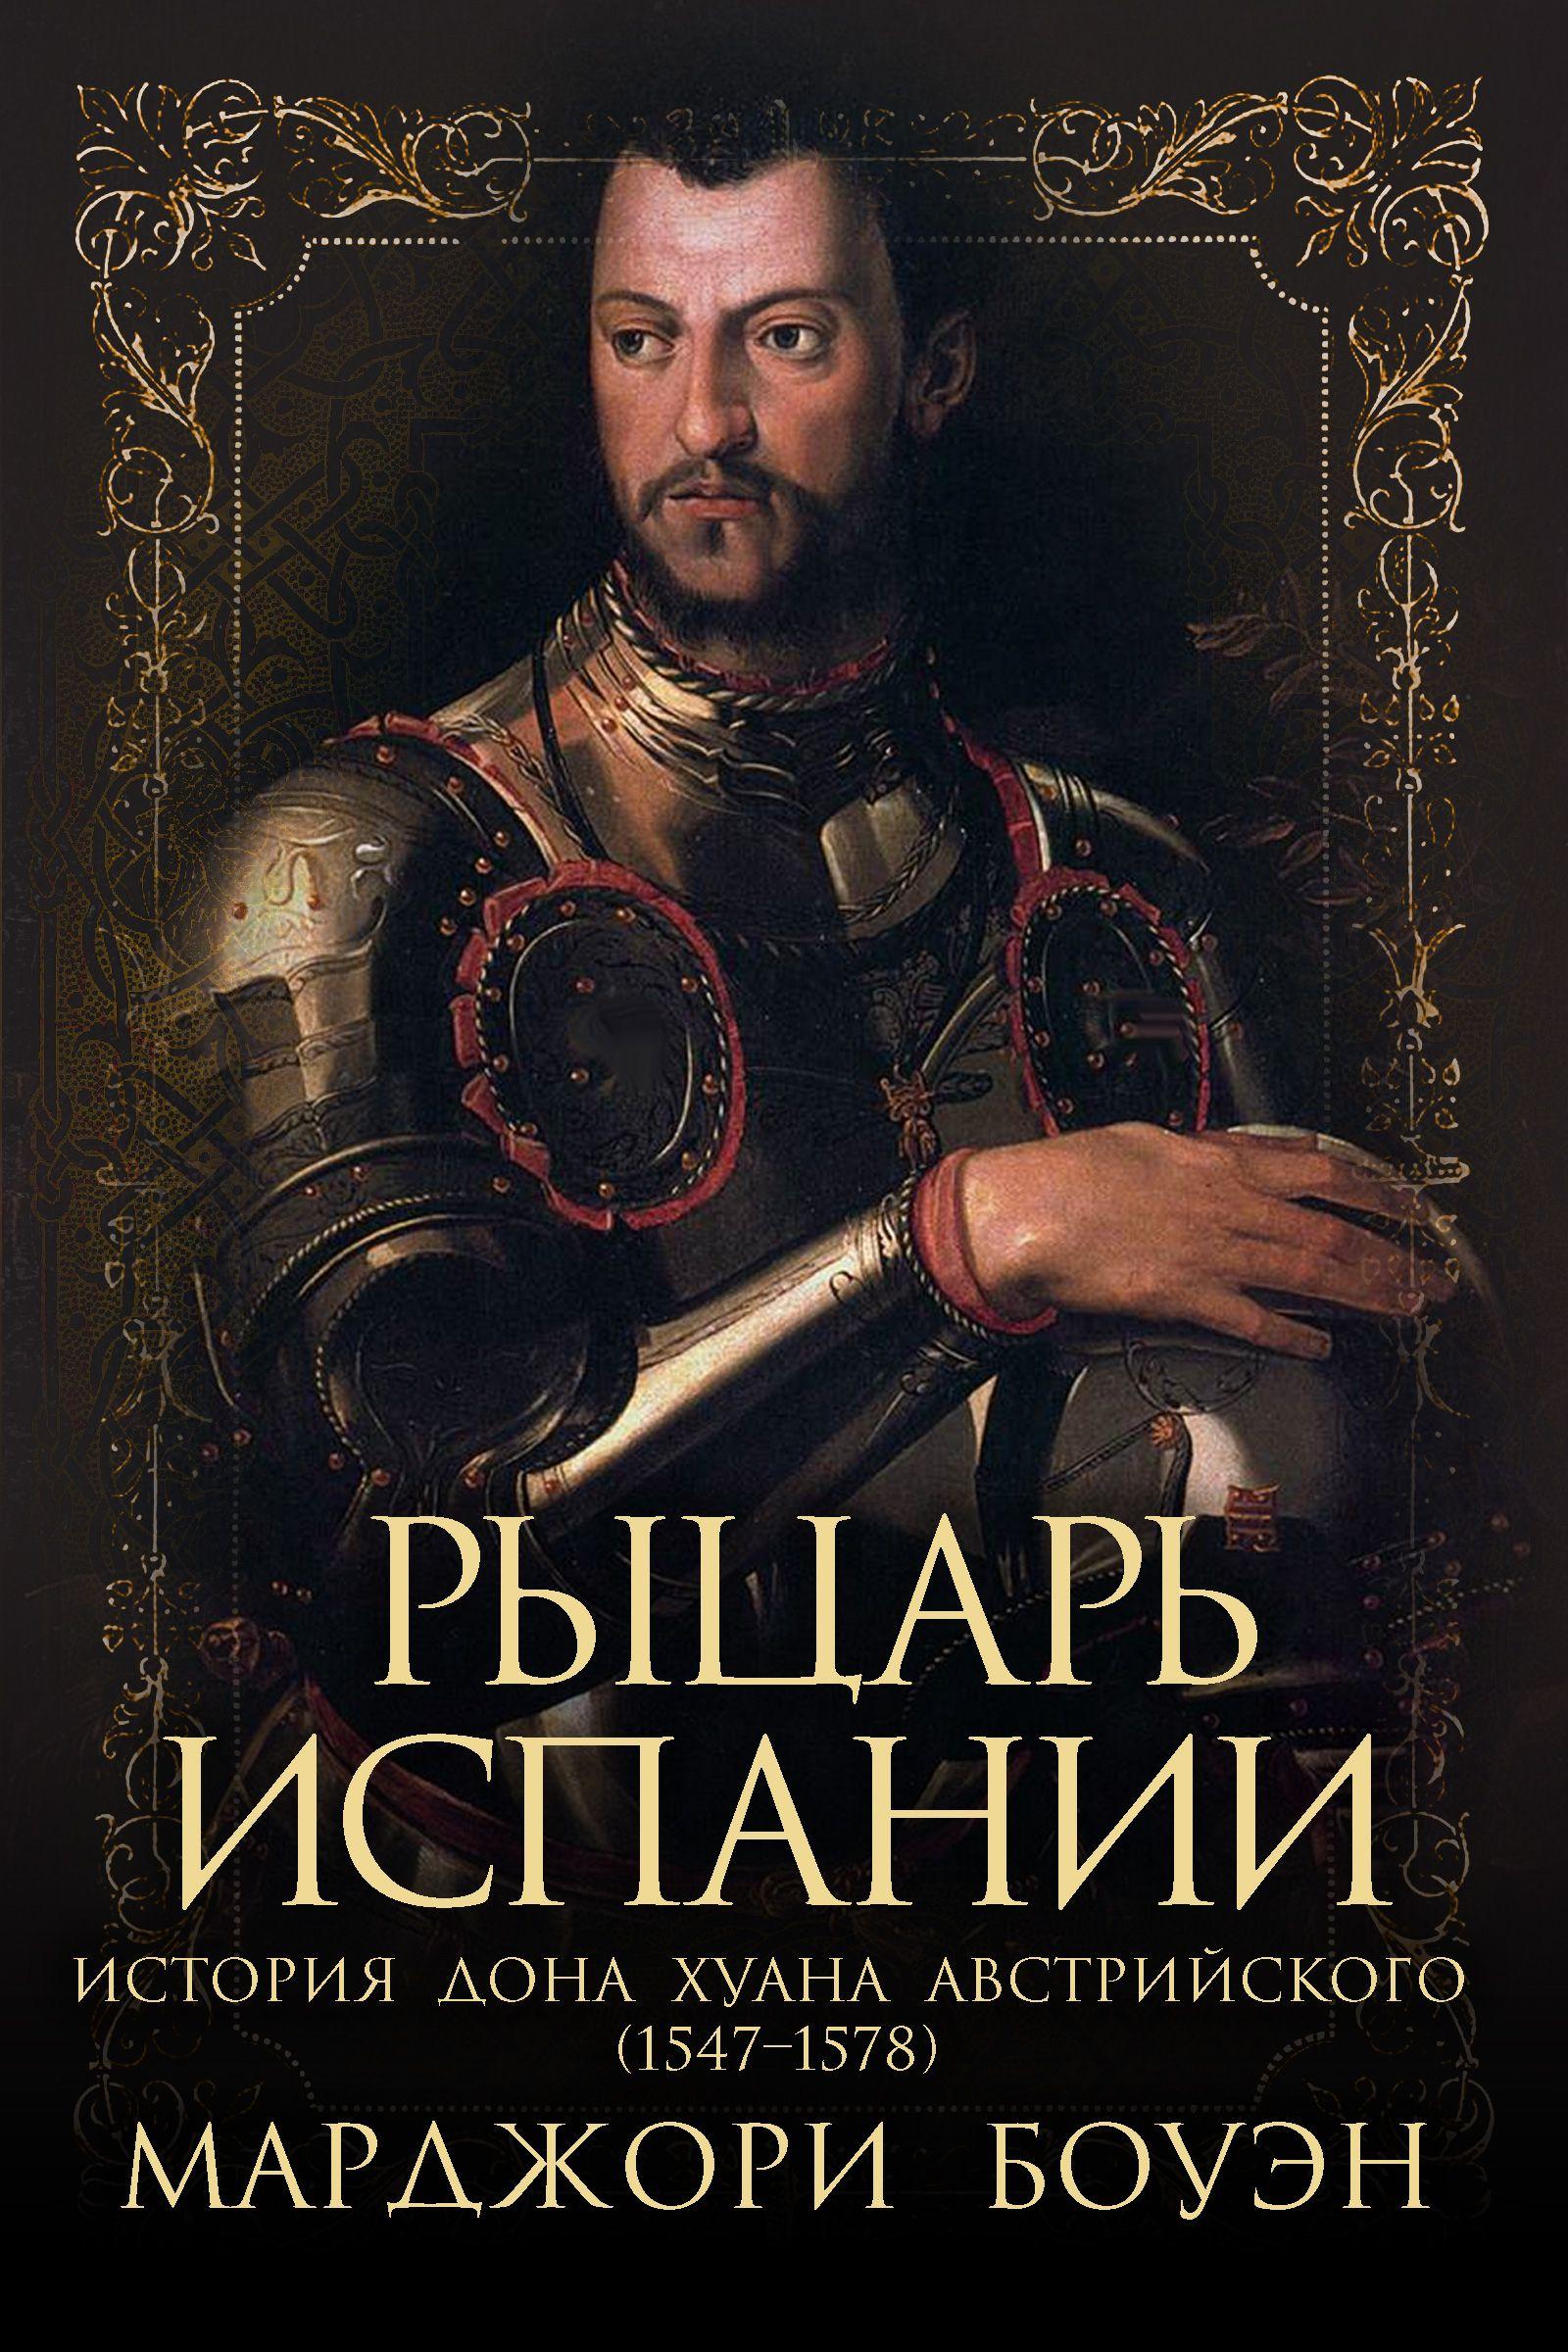 Купить книгу Рыцарь Испании, автора Марджори Боуэн